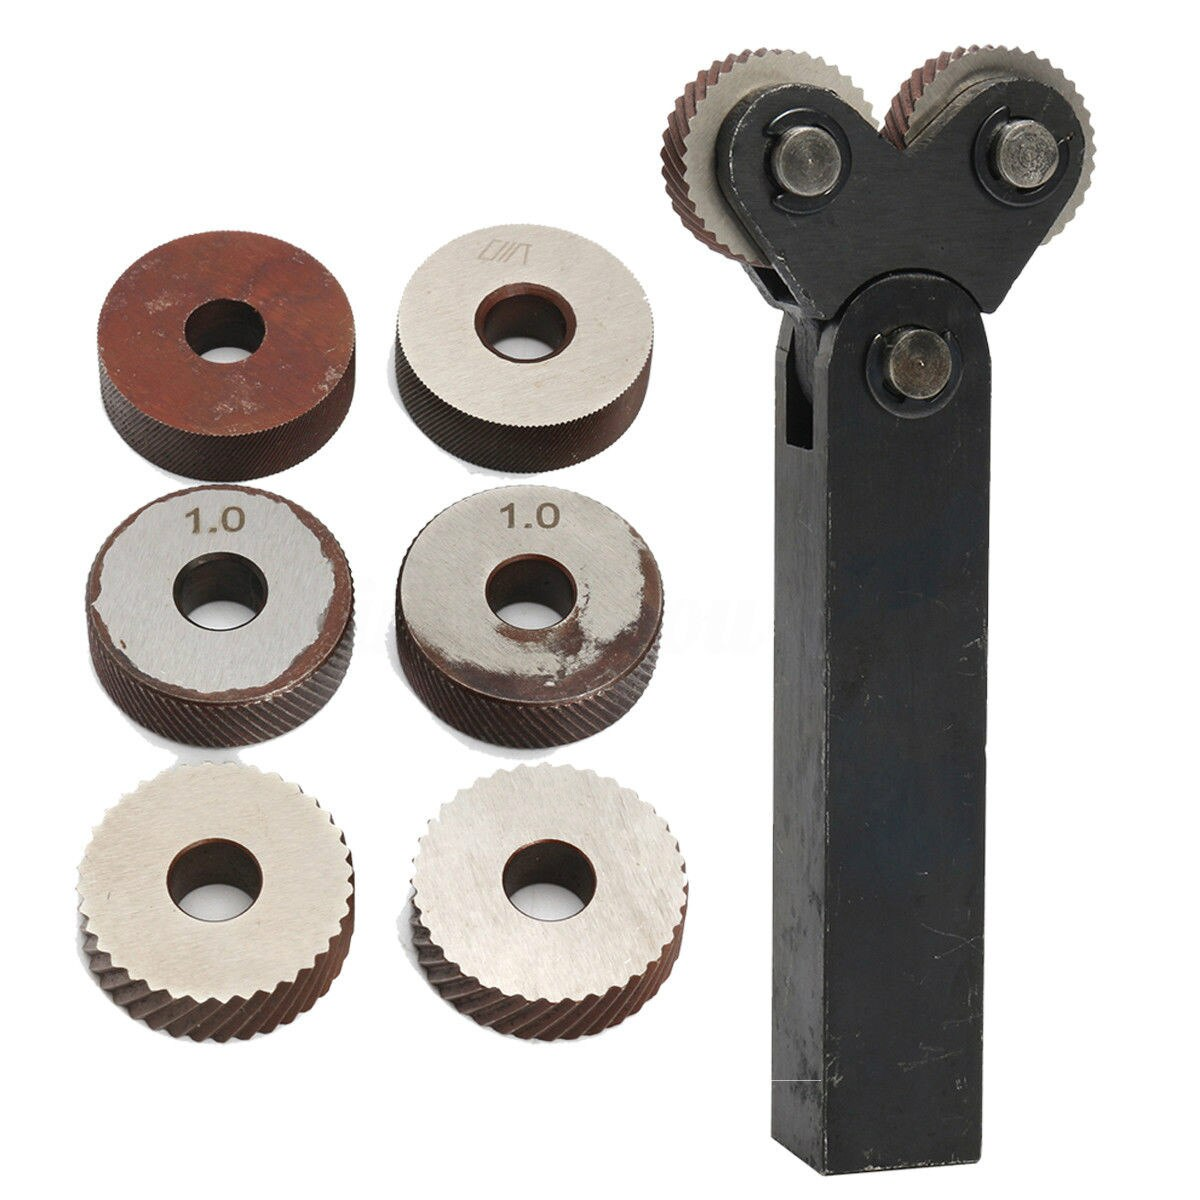 7 pces de aço duplo roda serrilhamento conjunto de ferramentas com diagonal linear knurl roda 1.2/2.5/3.0mm passo linear knurl conjunto torno cortador